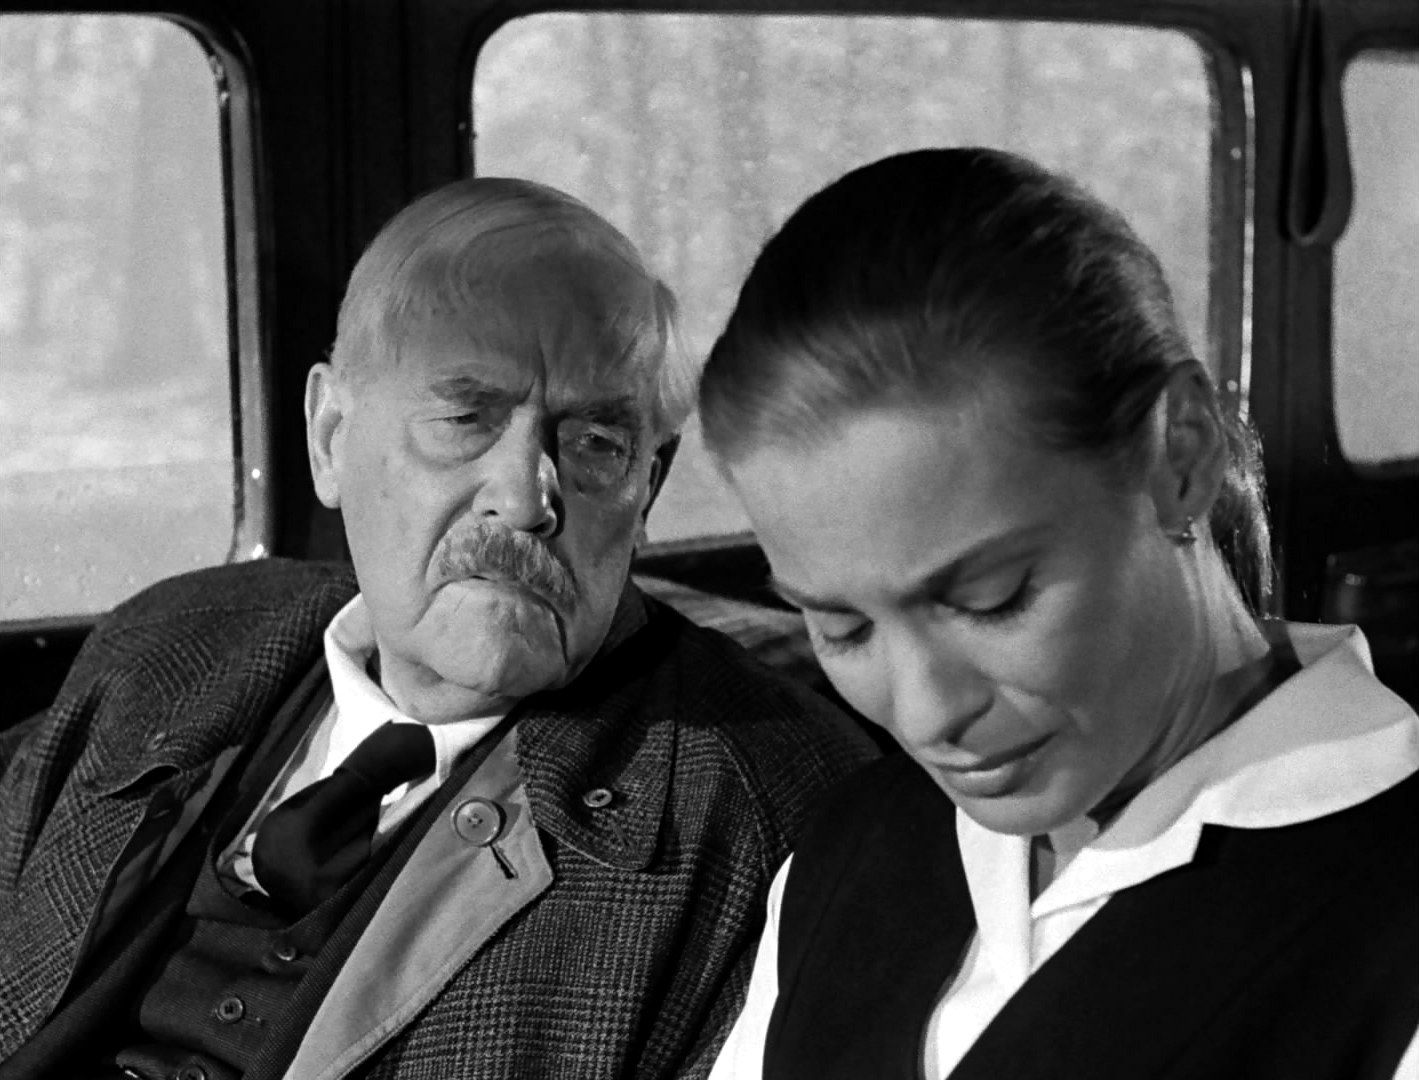 Wild Strawberries, 1957, Ingmar Bergman. Movie director